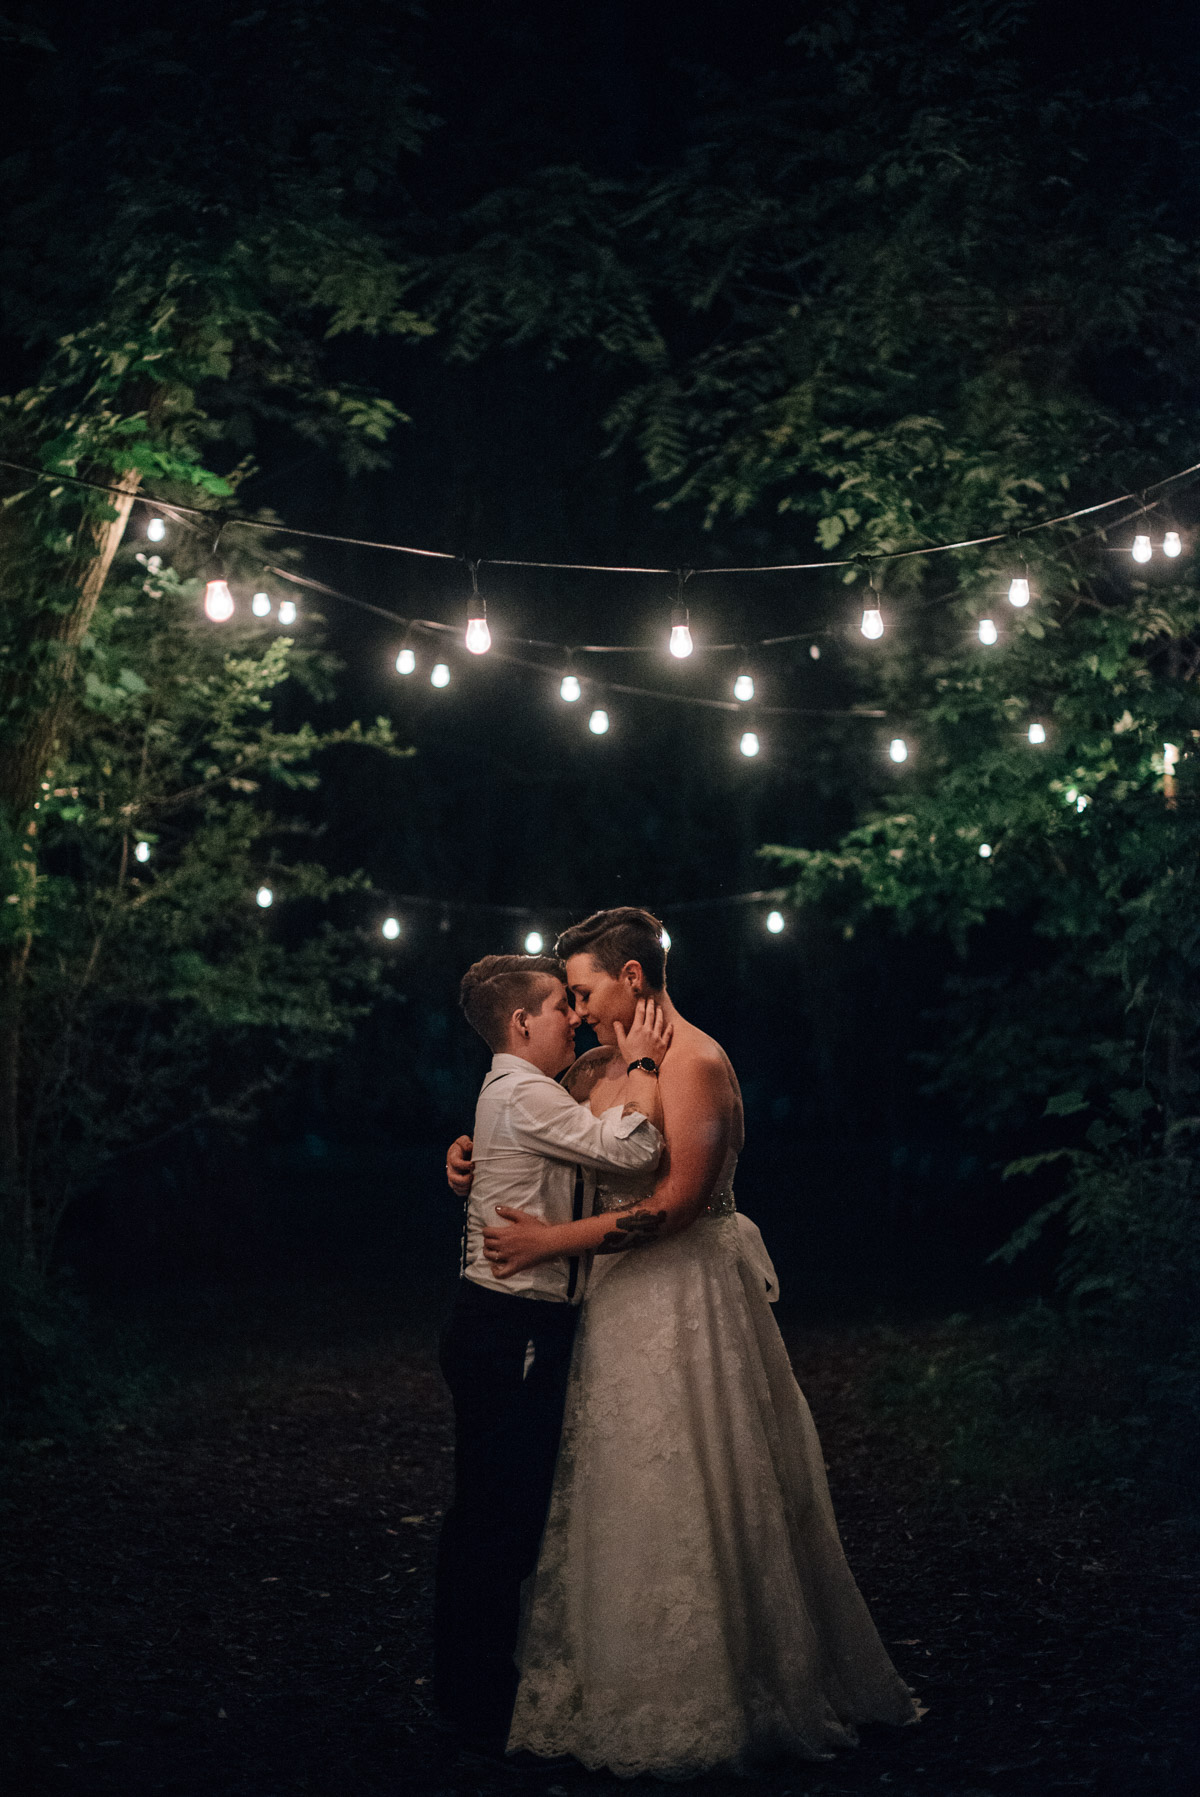 sara-wilde-photography-vineyard-bride-swish-list-beamer-falls-manor-grimsby-wedding-72.jpg